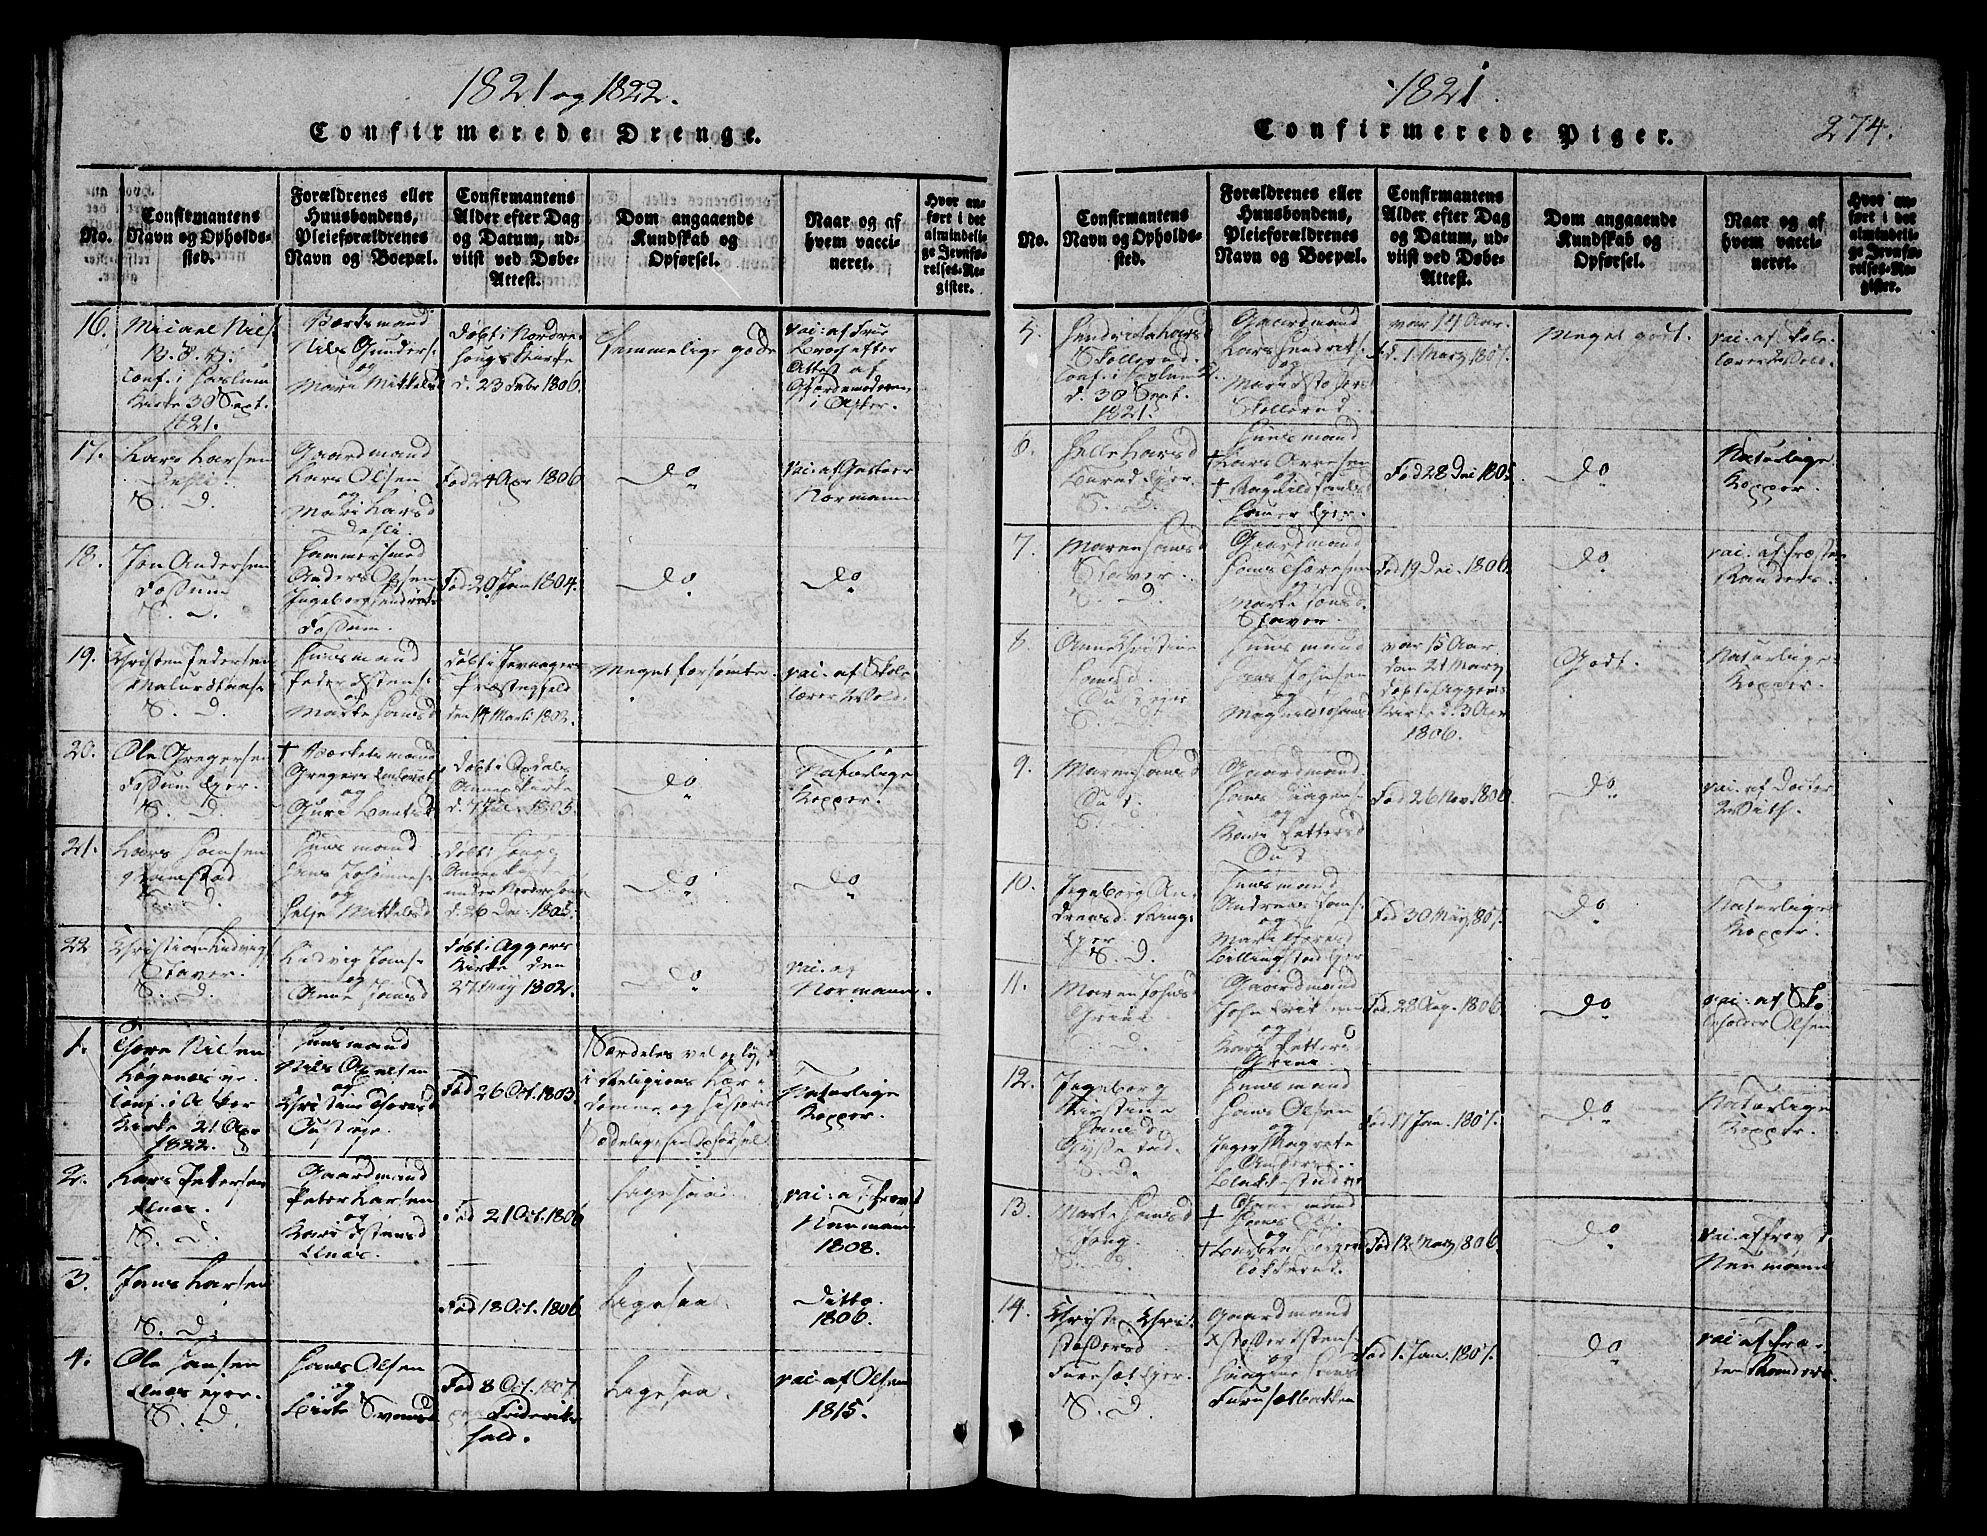 SAO, Asker prestekontor Kirkebøker, G/Ga/L0001: Klokkerbok nr. I 1, 1814-1830, s. 274